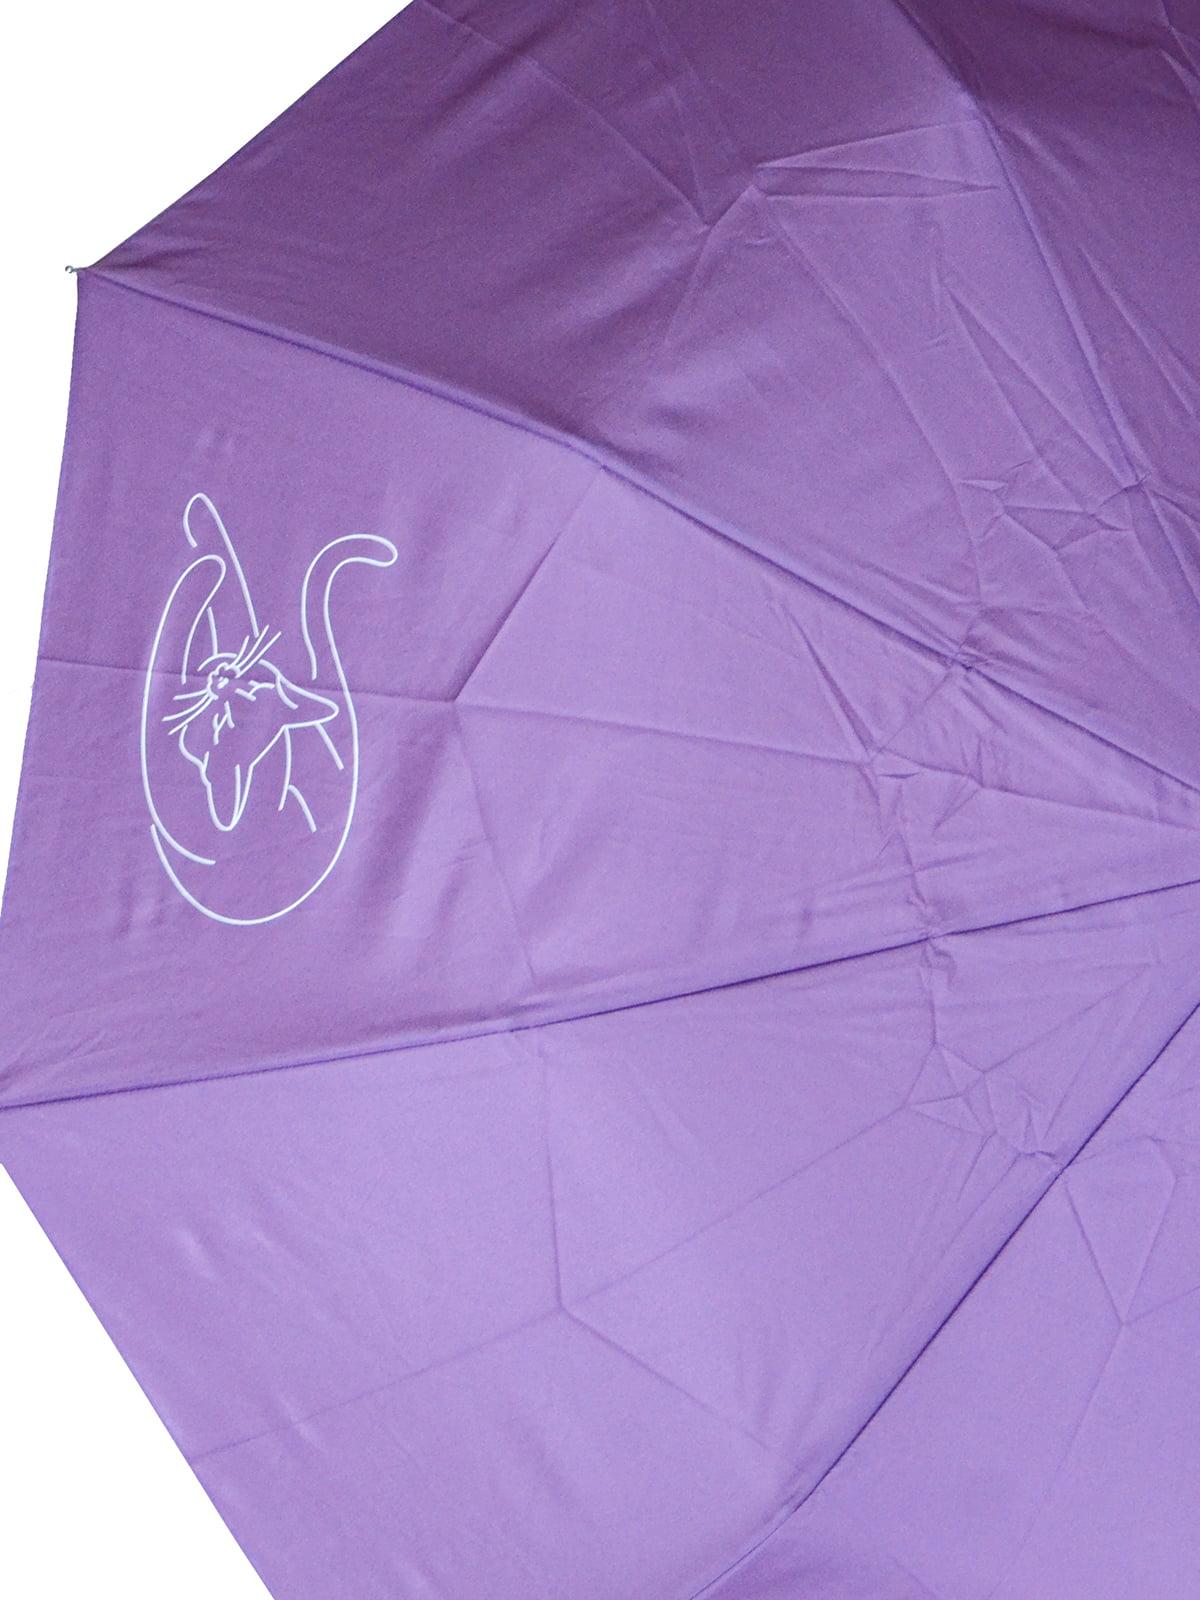 Зонт | 4230674 | фото 2